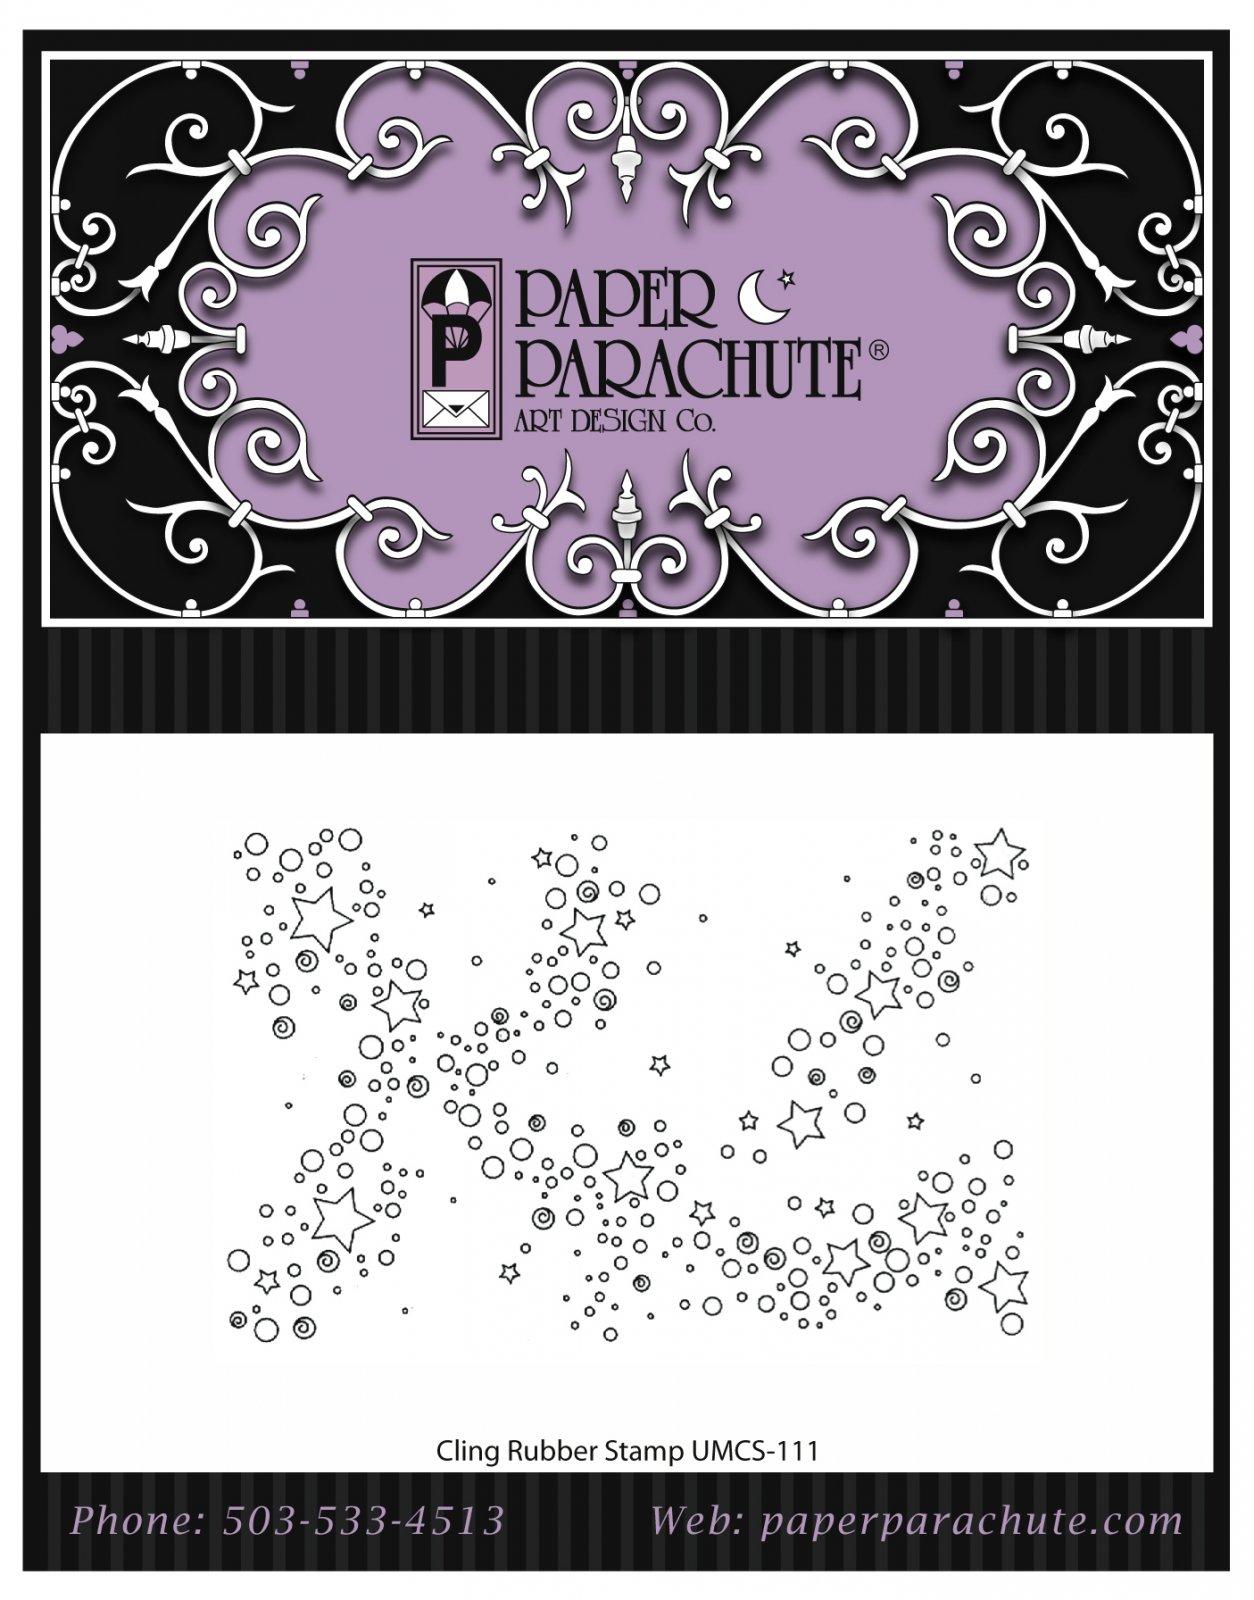 Paper Parachute Rubber Stamp - UMCS111